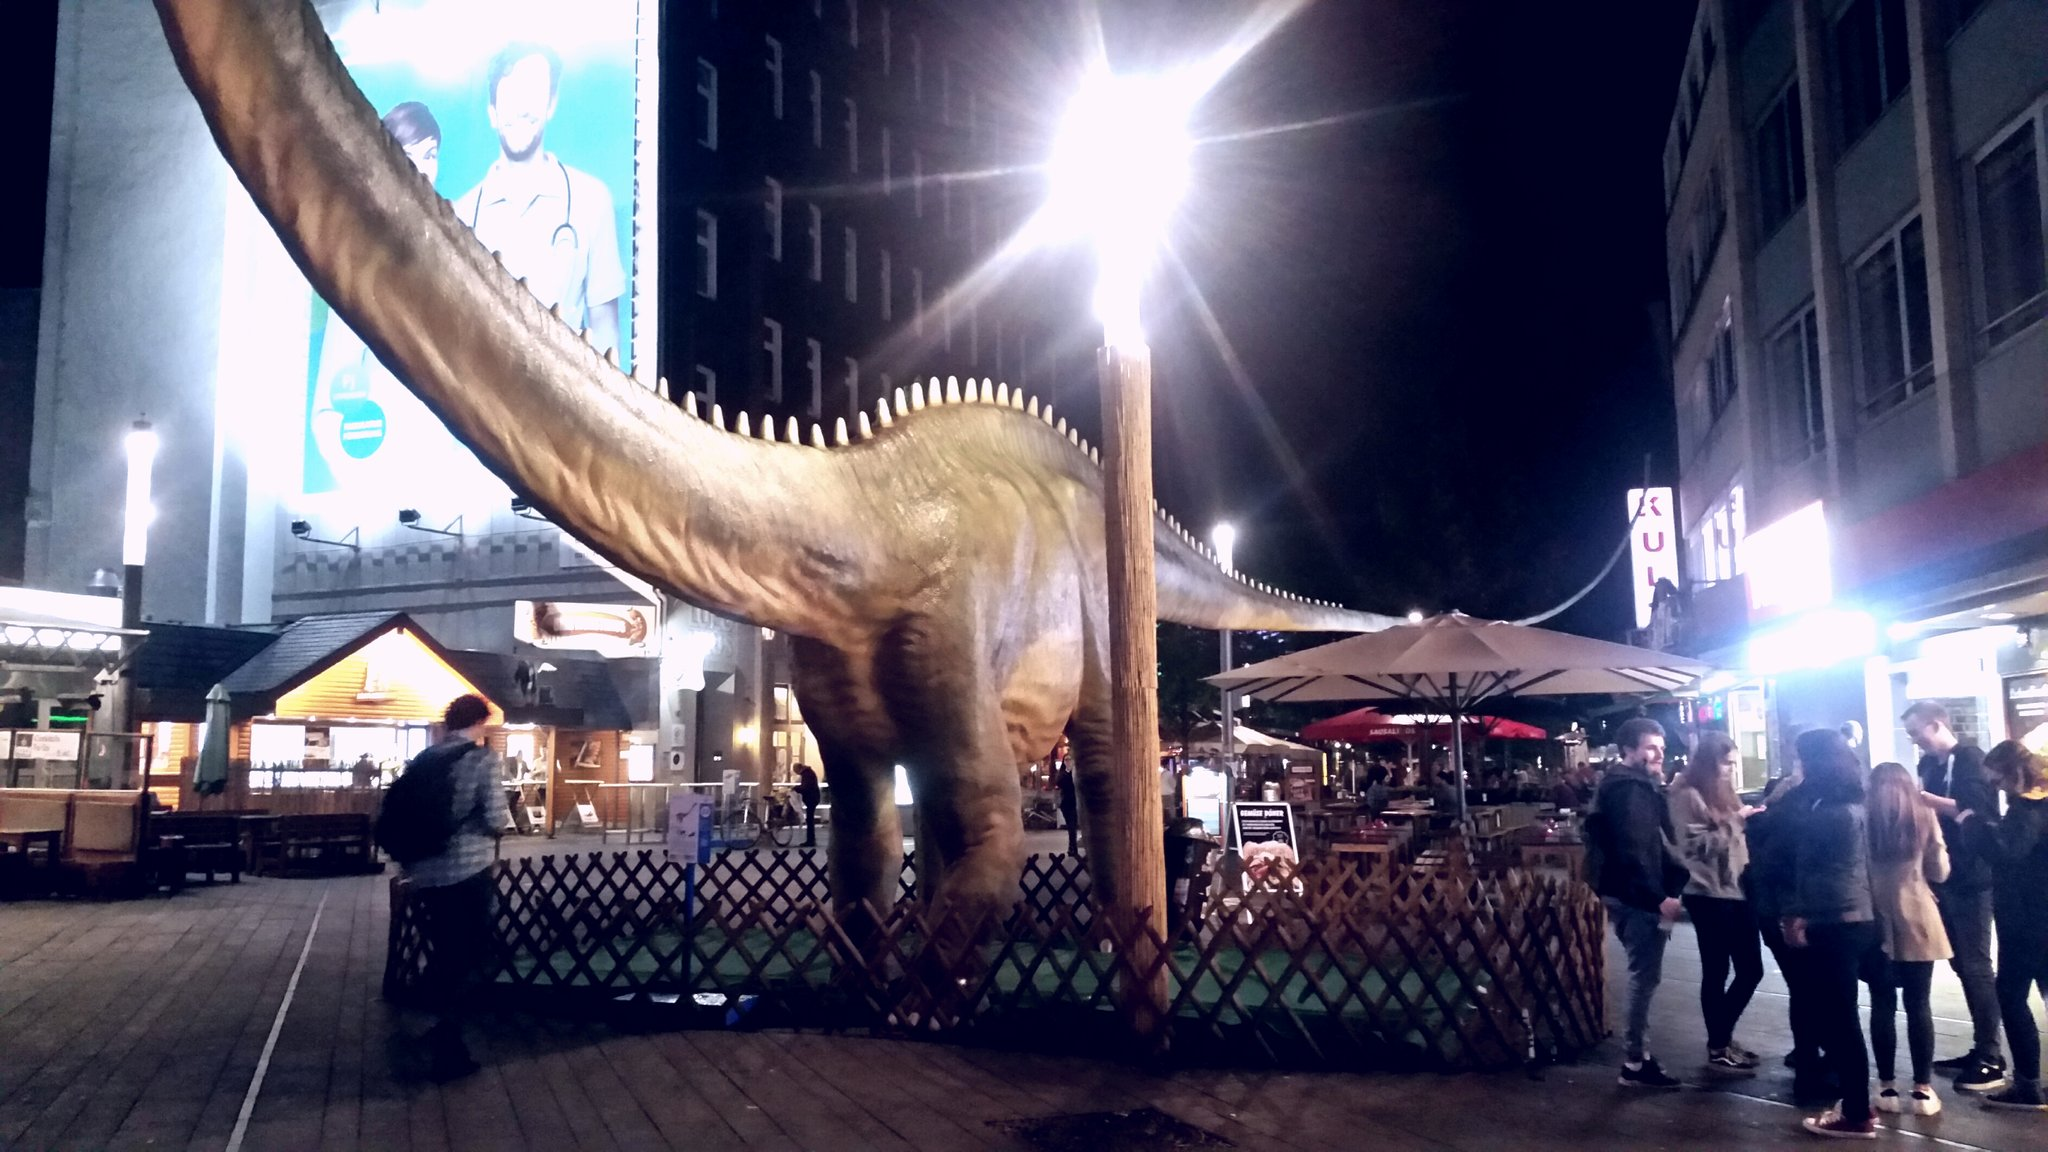 Dino City Bochum Karte.Jurassic World Bochum Im Ausnahmezustand Hilfe Die Dinosaurier